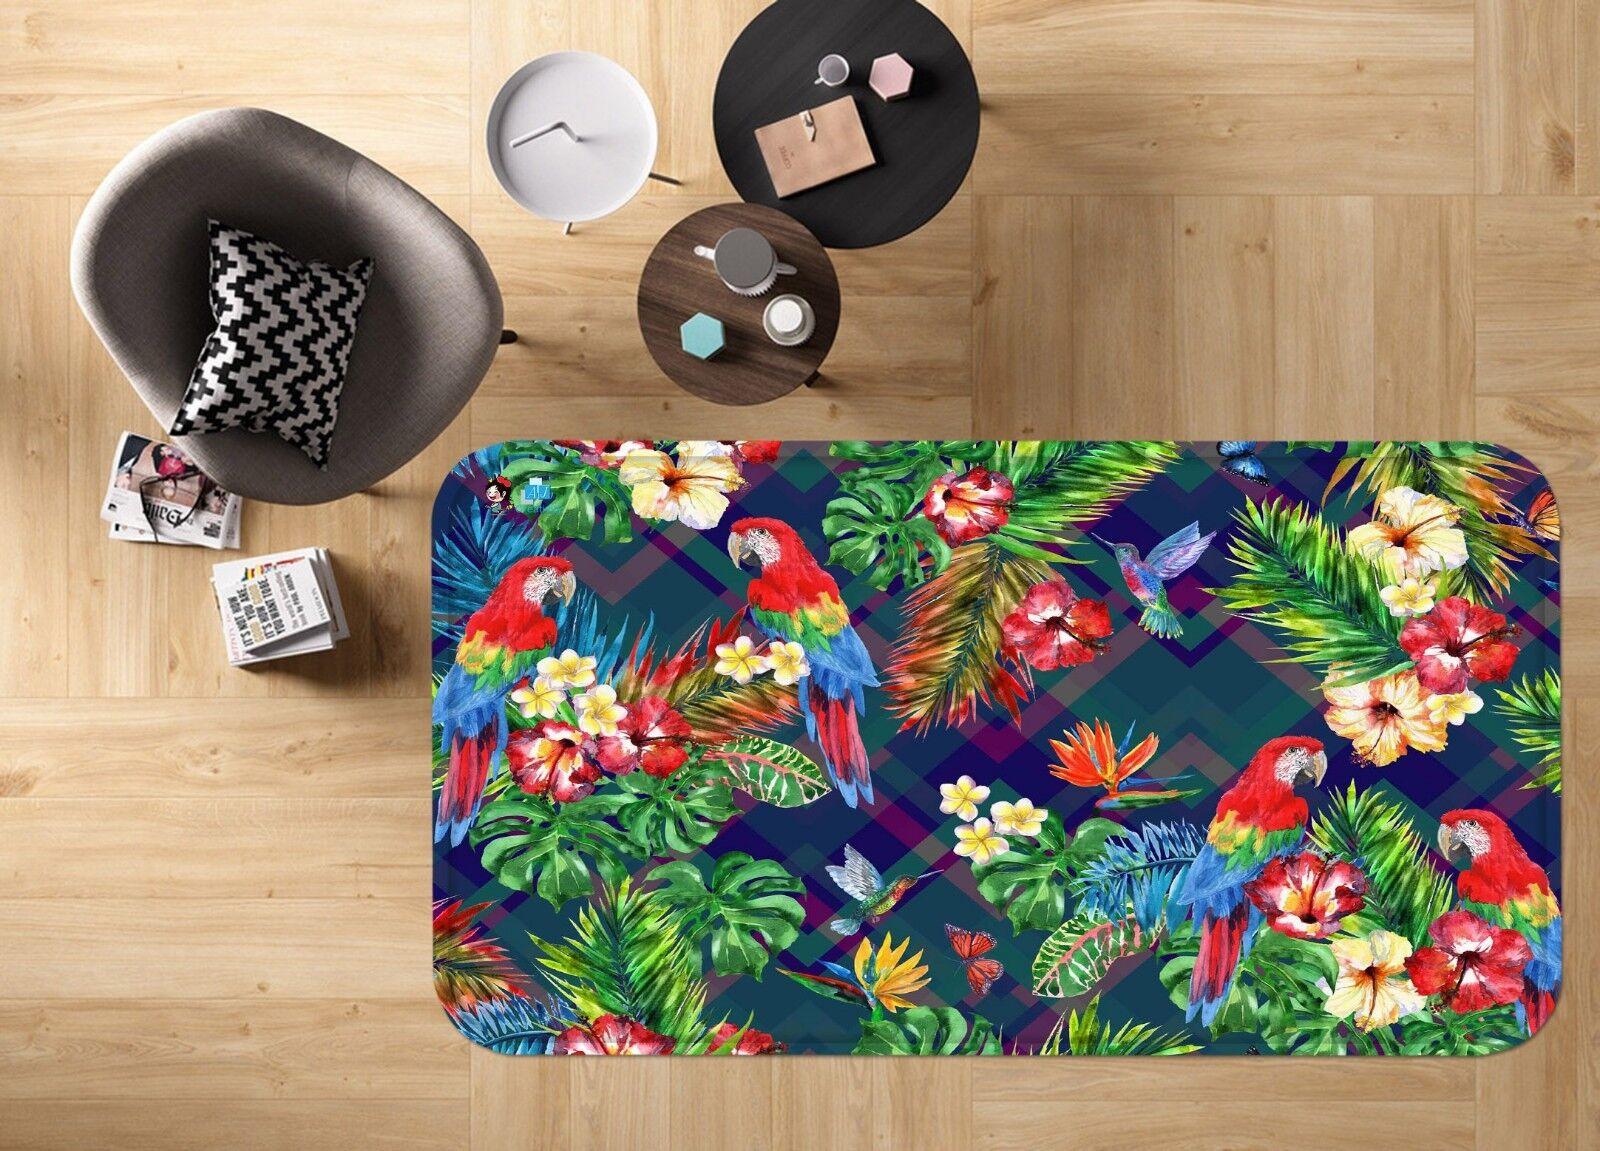 Tapis tapis 3D Parrot Jungle 683 antidérapant Qualité Tapis Photo élégant Royaume-Uni